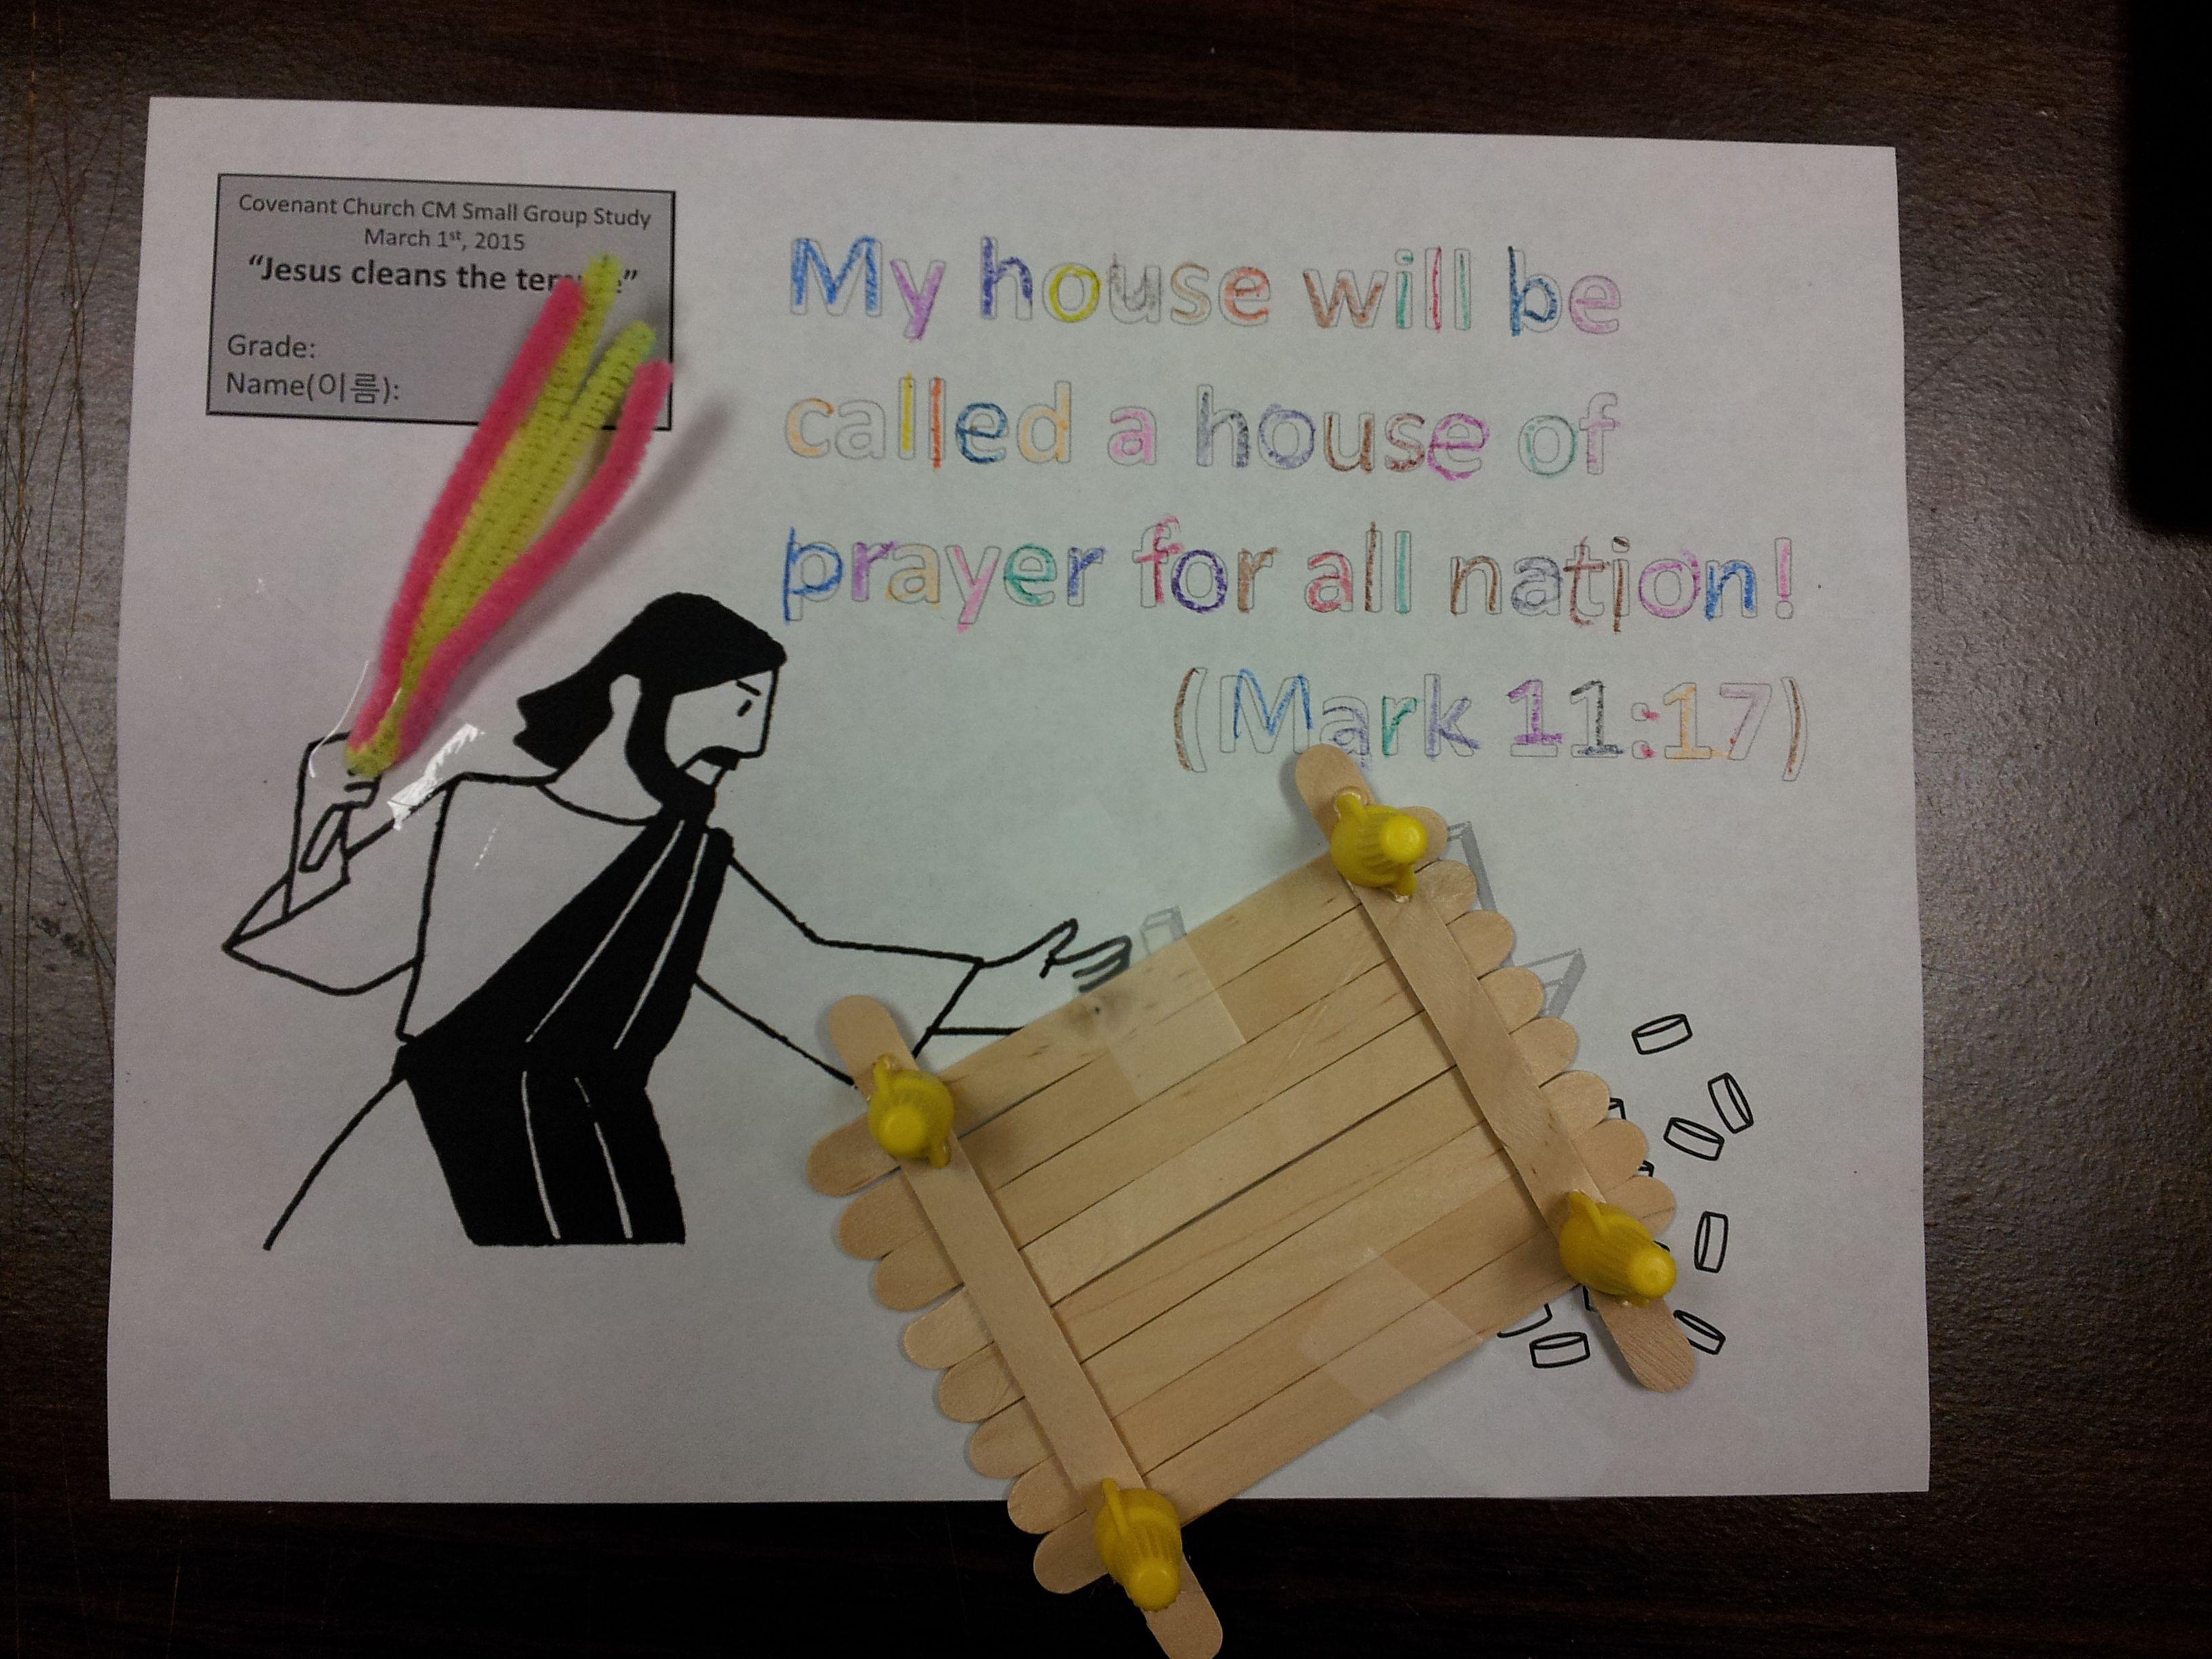 Pin Van Ageeth Backer Op Nt Jezus Tempelreiniging Jesus